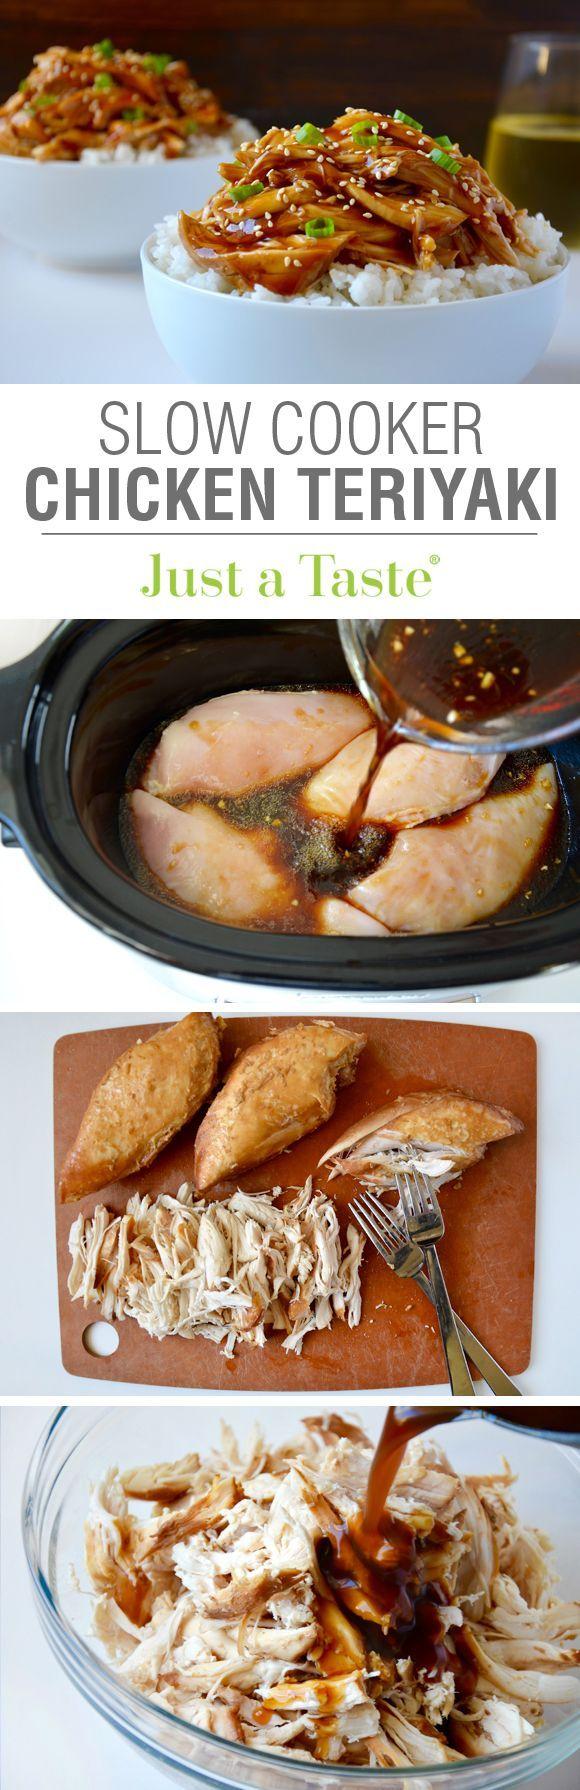 Slow Cooker Pulled Chicken Teriyaki Recipe via justataste.com | The ultimate easy dinner recipe!